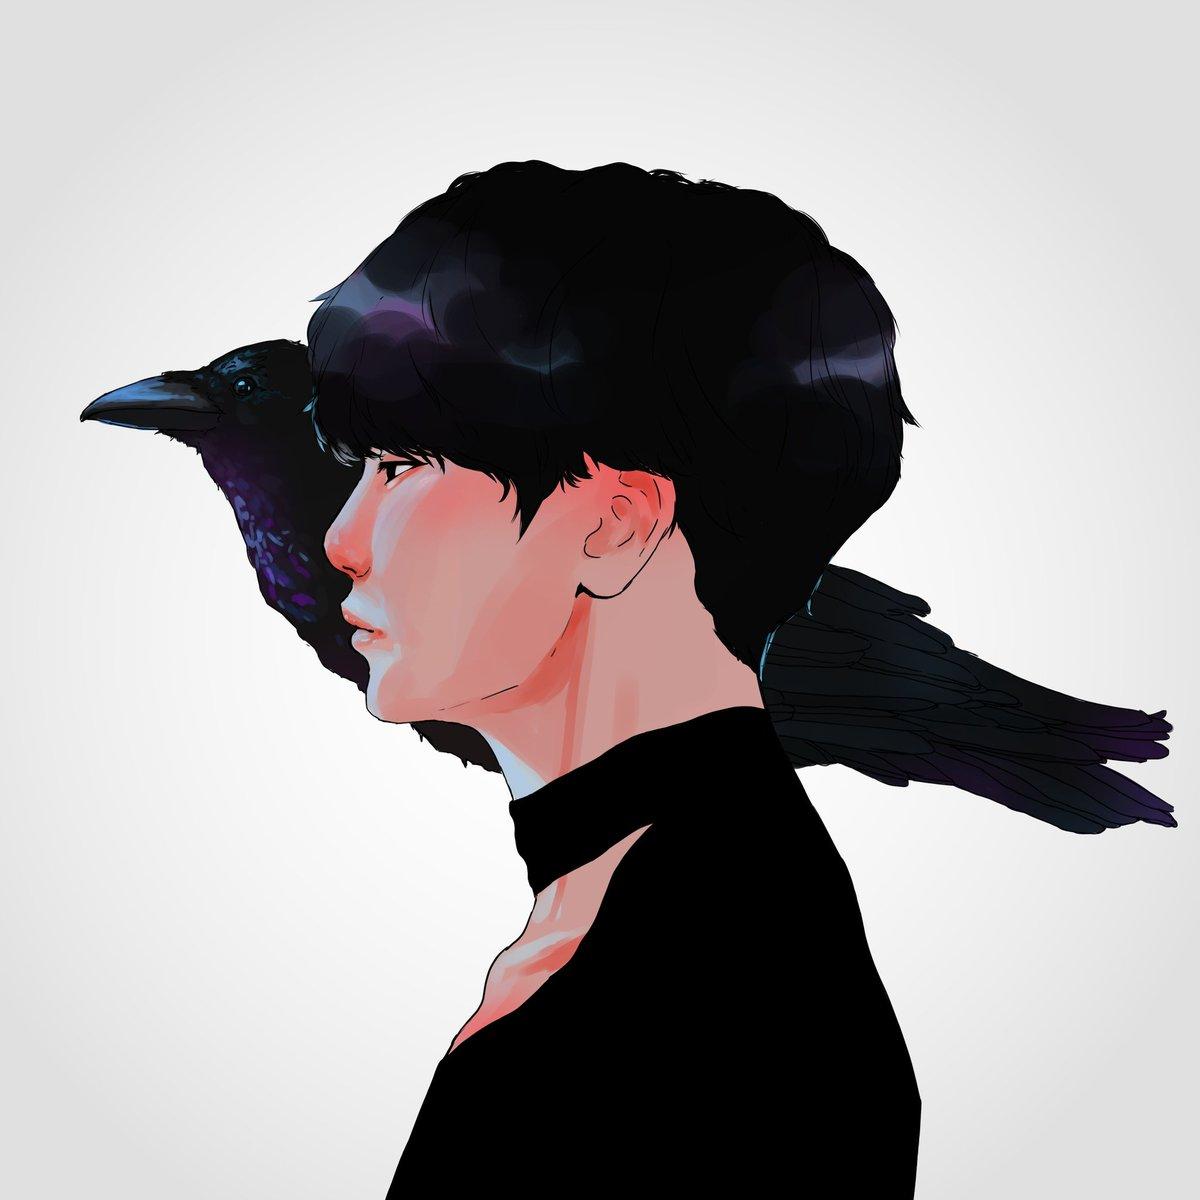 I decided to redraw my first ever drawing of yoongi ahh #yoongi #btsfanart<br>http://pic.twitter.com/2kjwV3vRIj